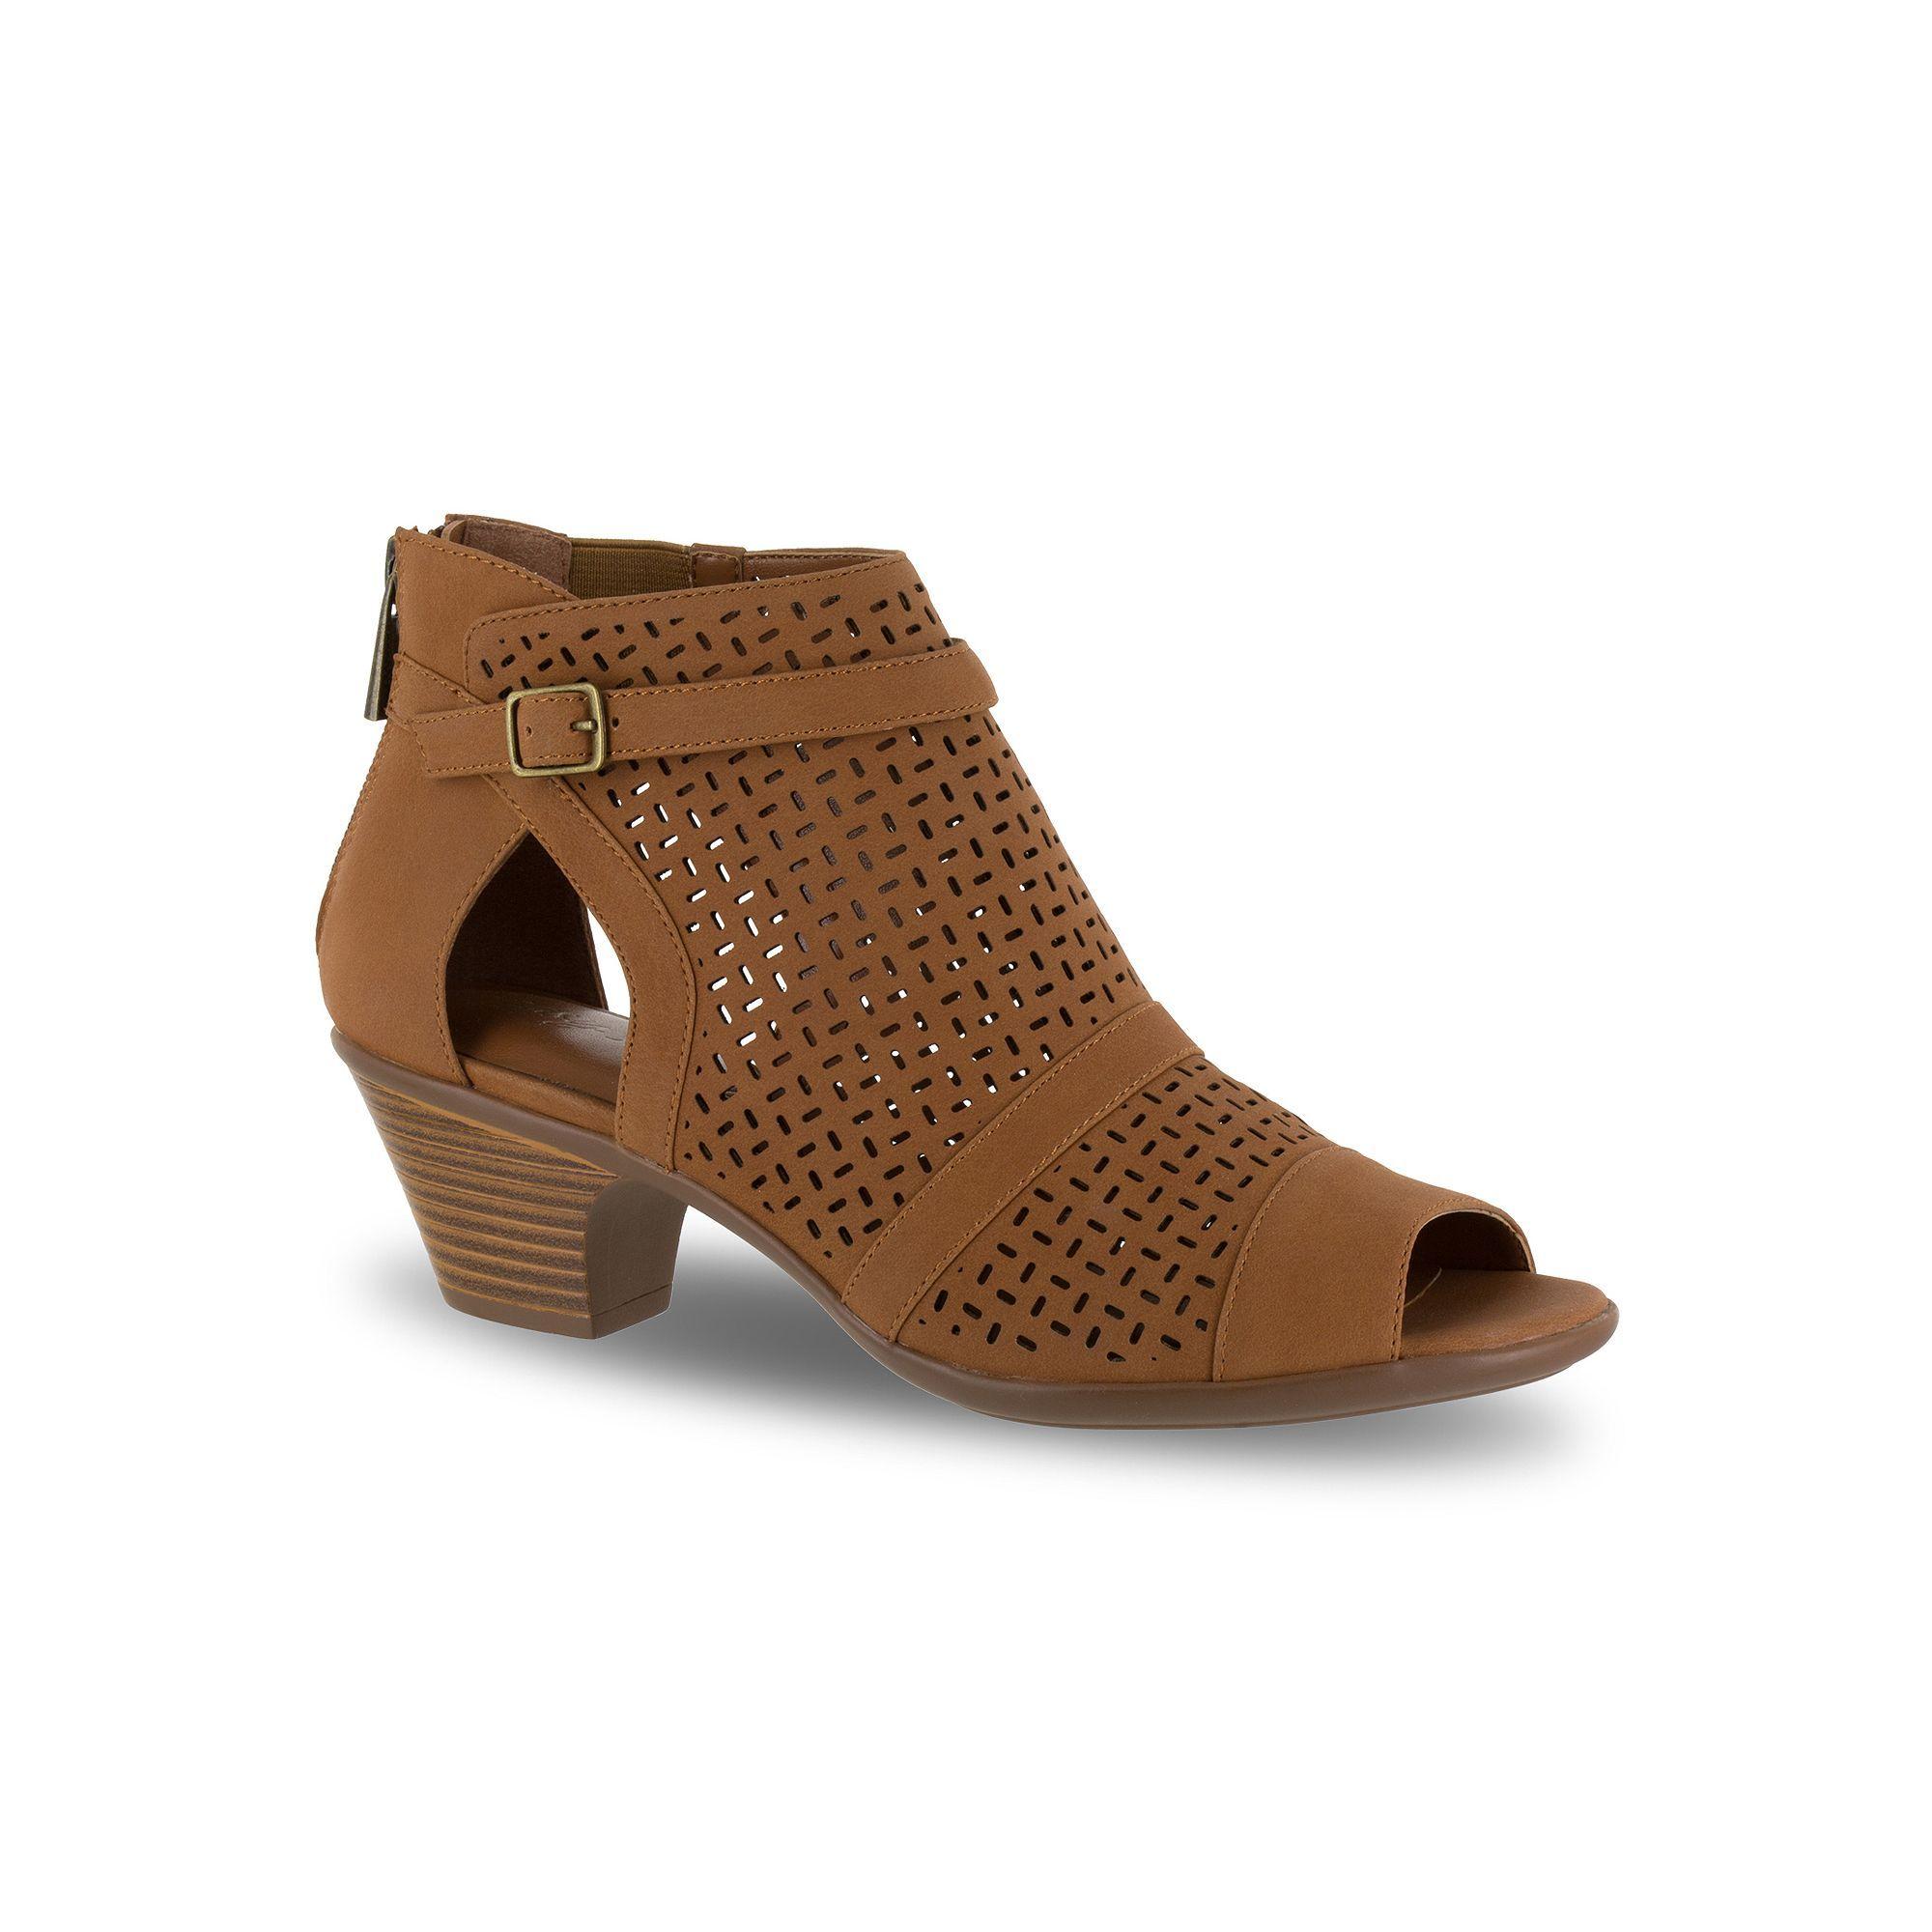 65d2e4ad42e8 Easy street carrigan women sandals size medium dark brown jpg 2000x2000 Dark  brown womens sandals